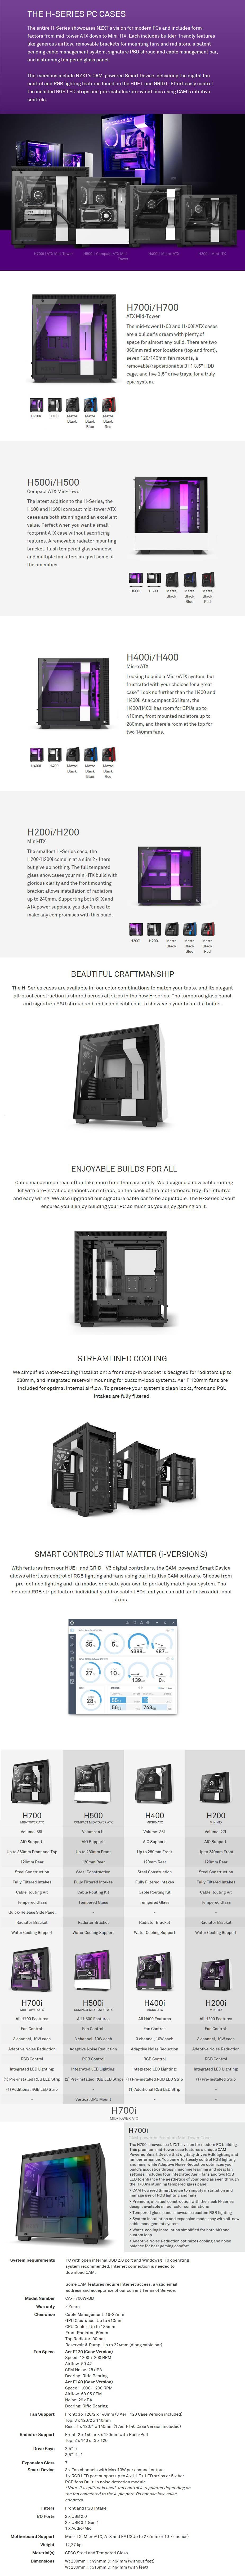 NZXT H700i Smart Tempered Glass Mid-Tower E-ATX Case - Matte Black - Desktop Overview 1